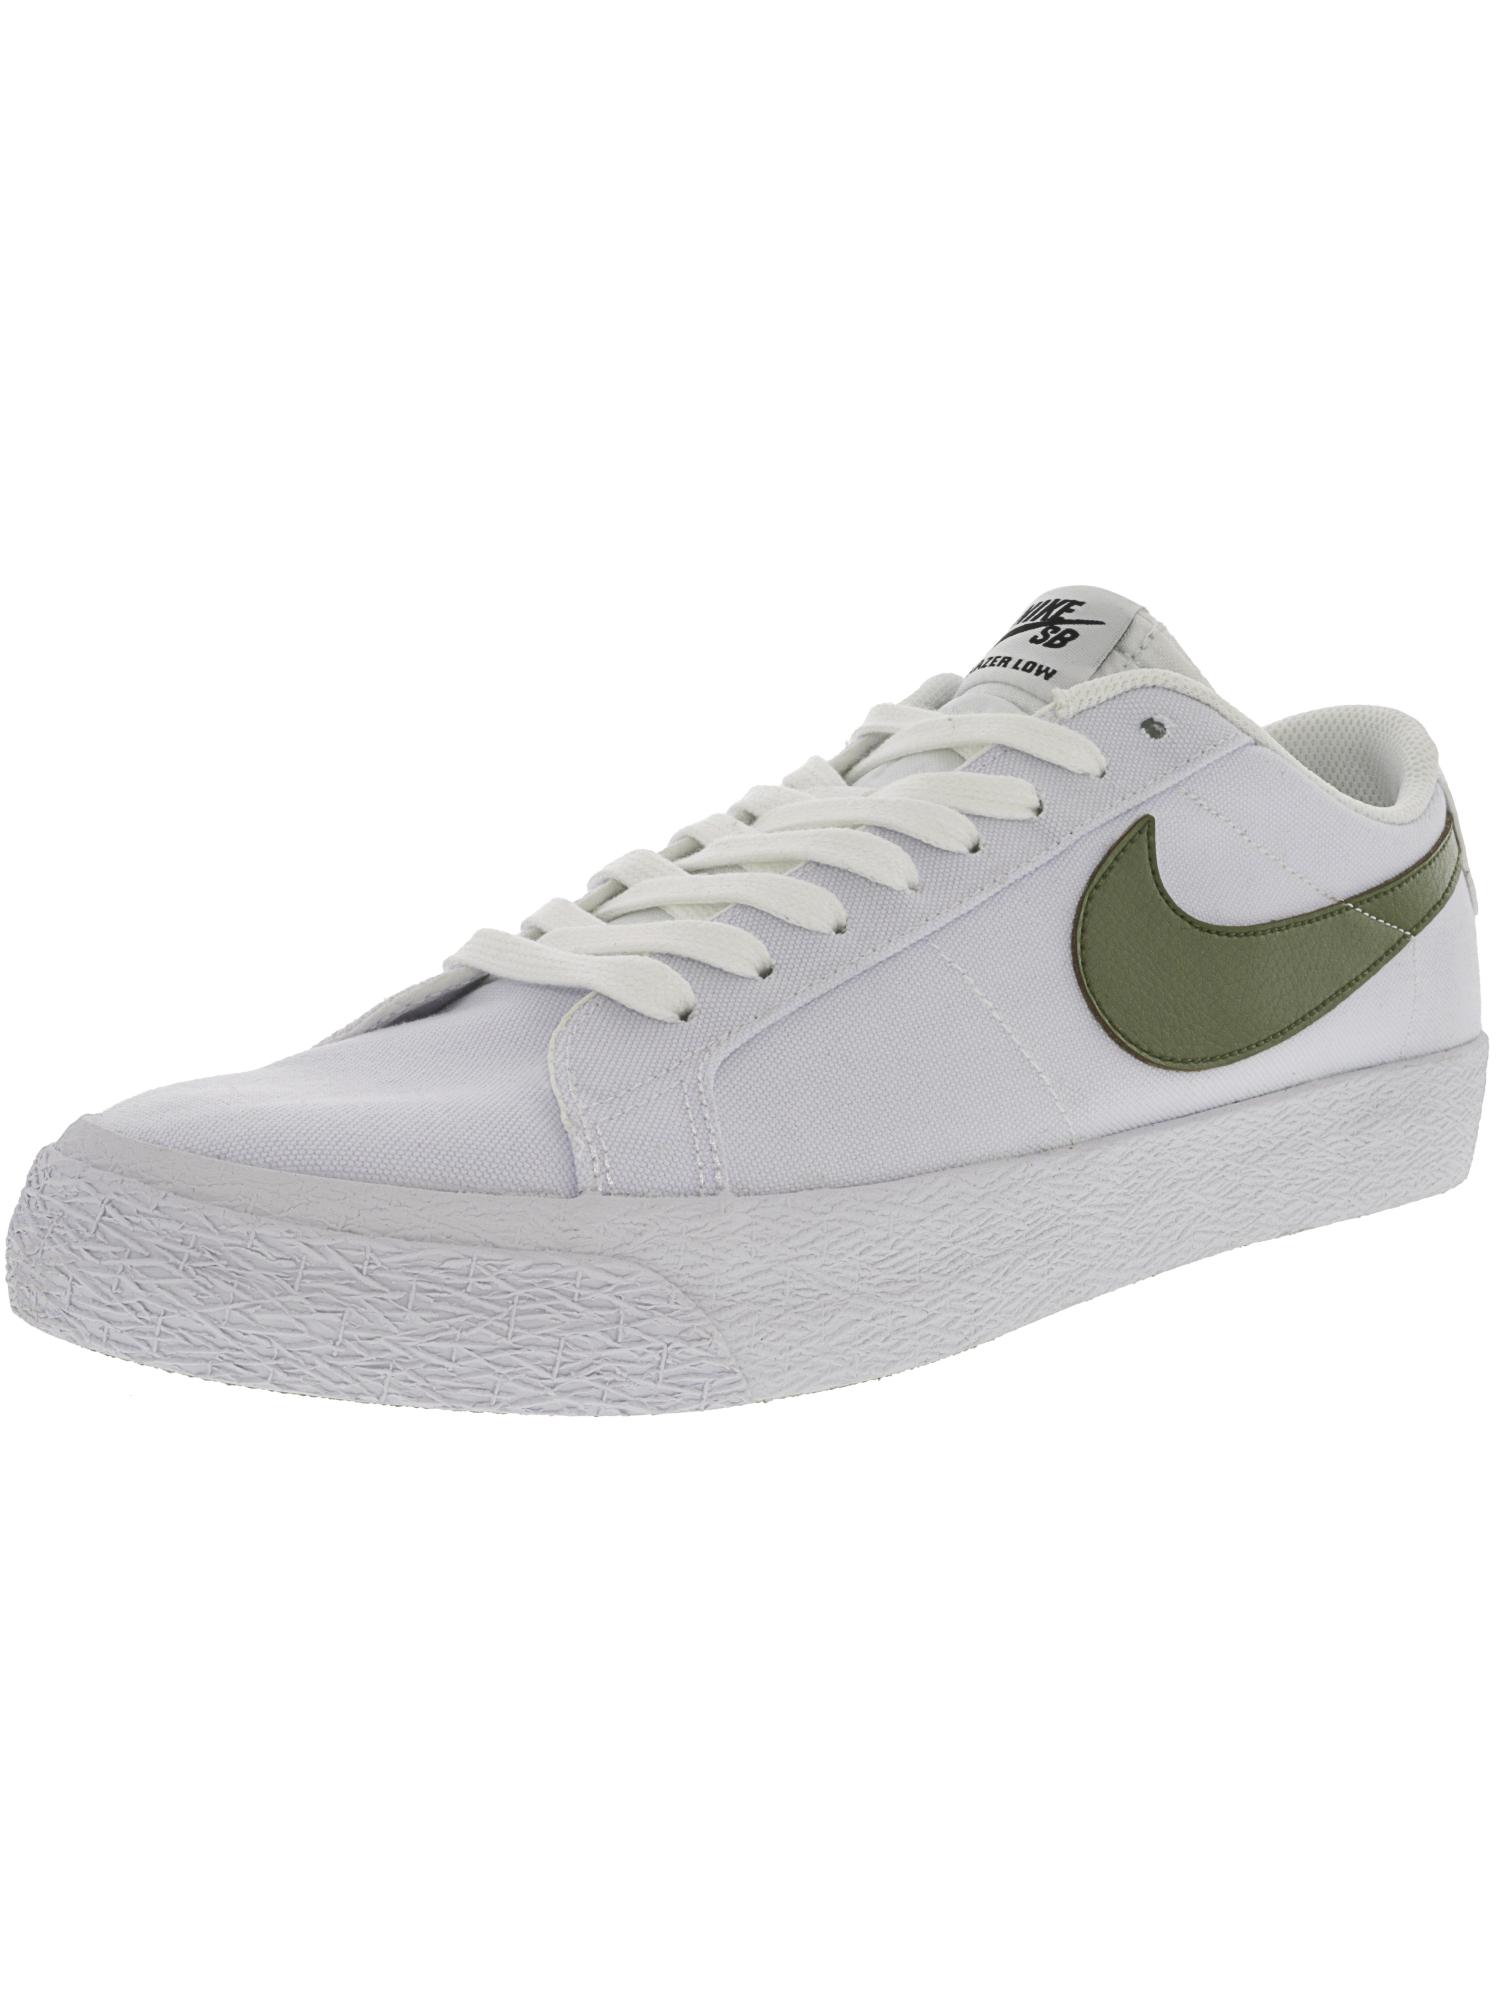 Nike-Men-039-s-Sb-Blazer-Zoom-Low-